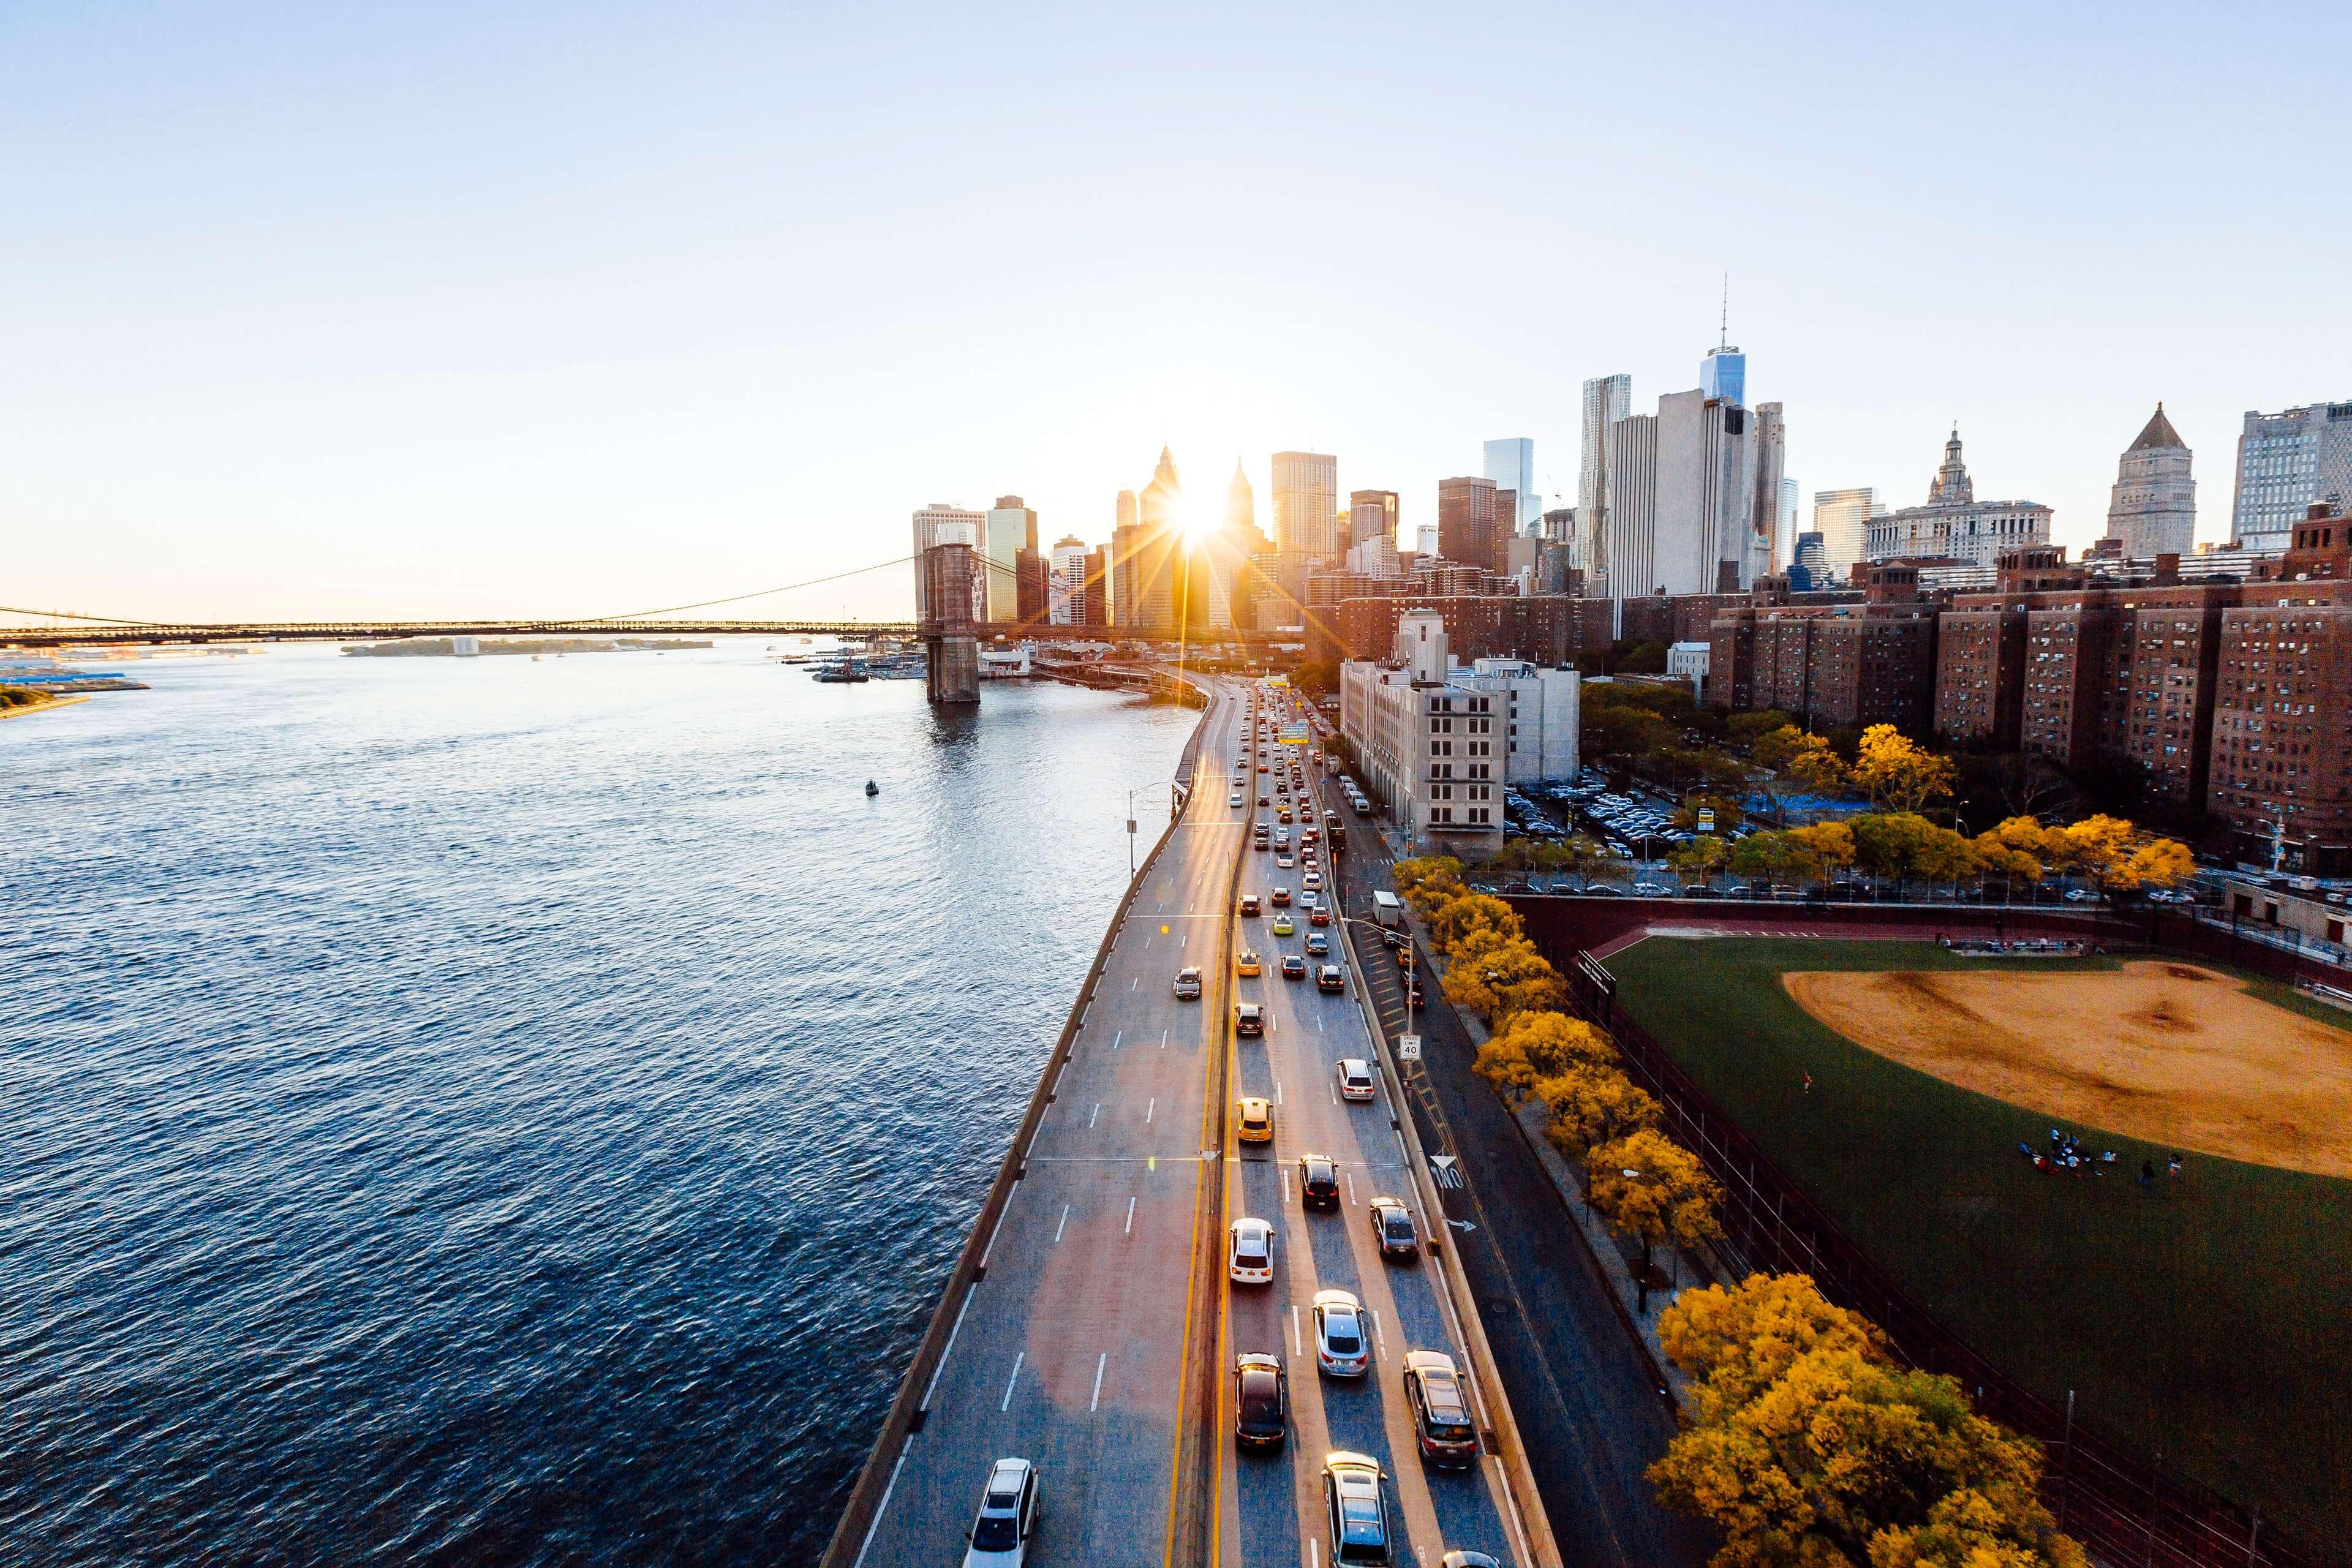 New York cityscape image